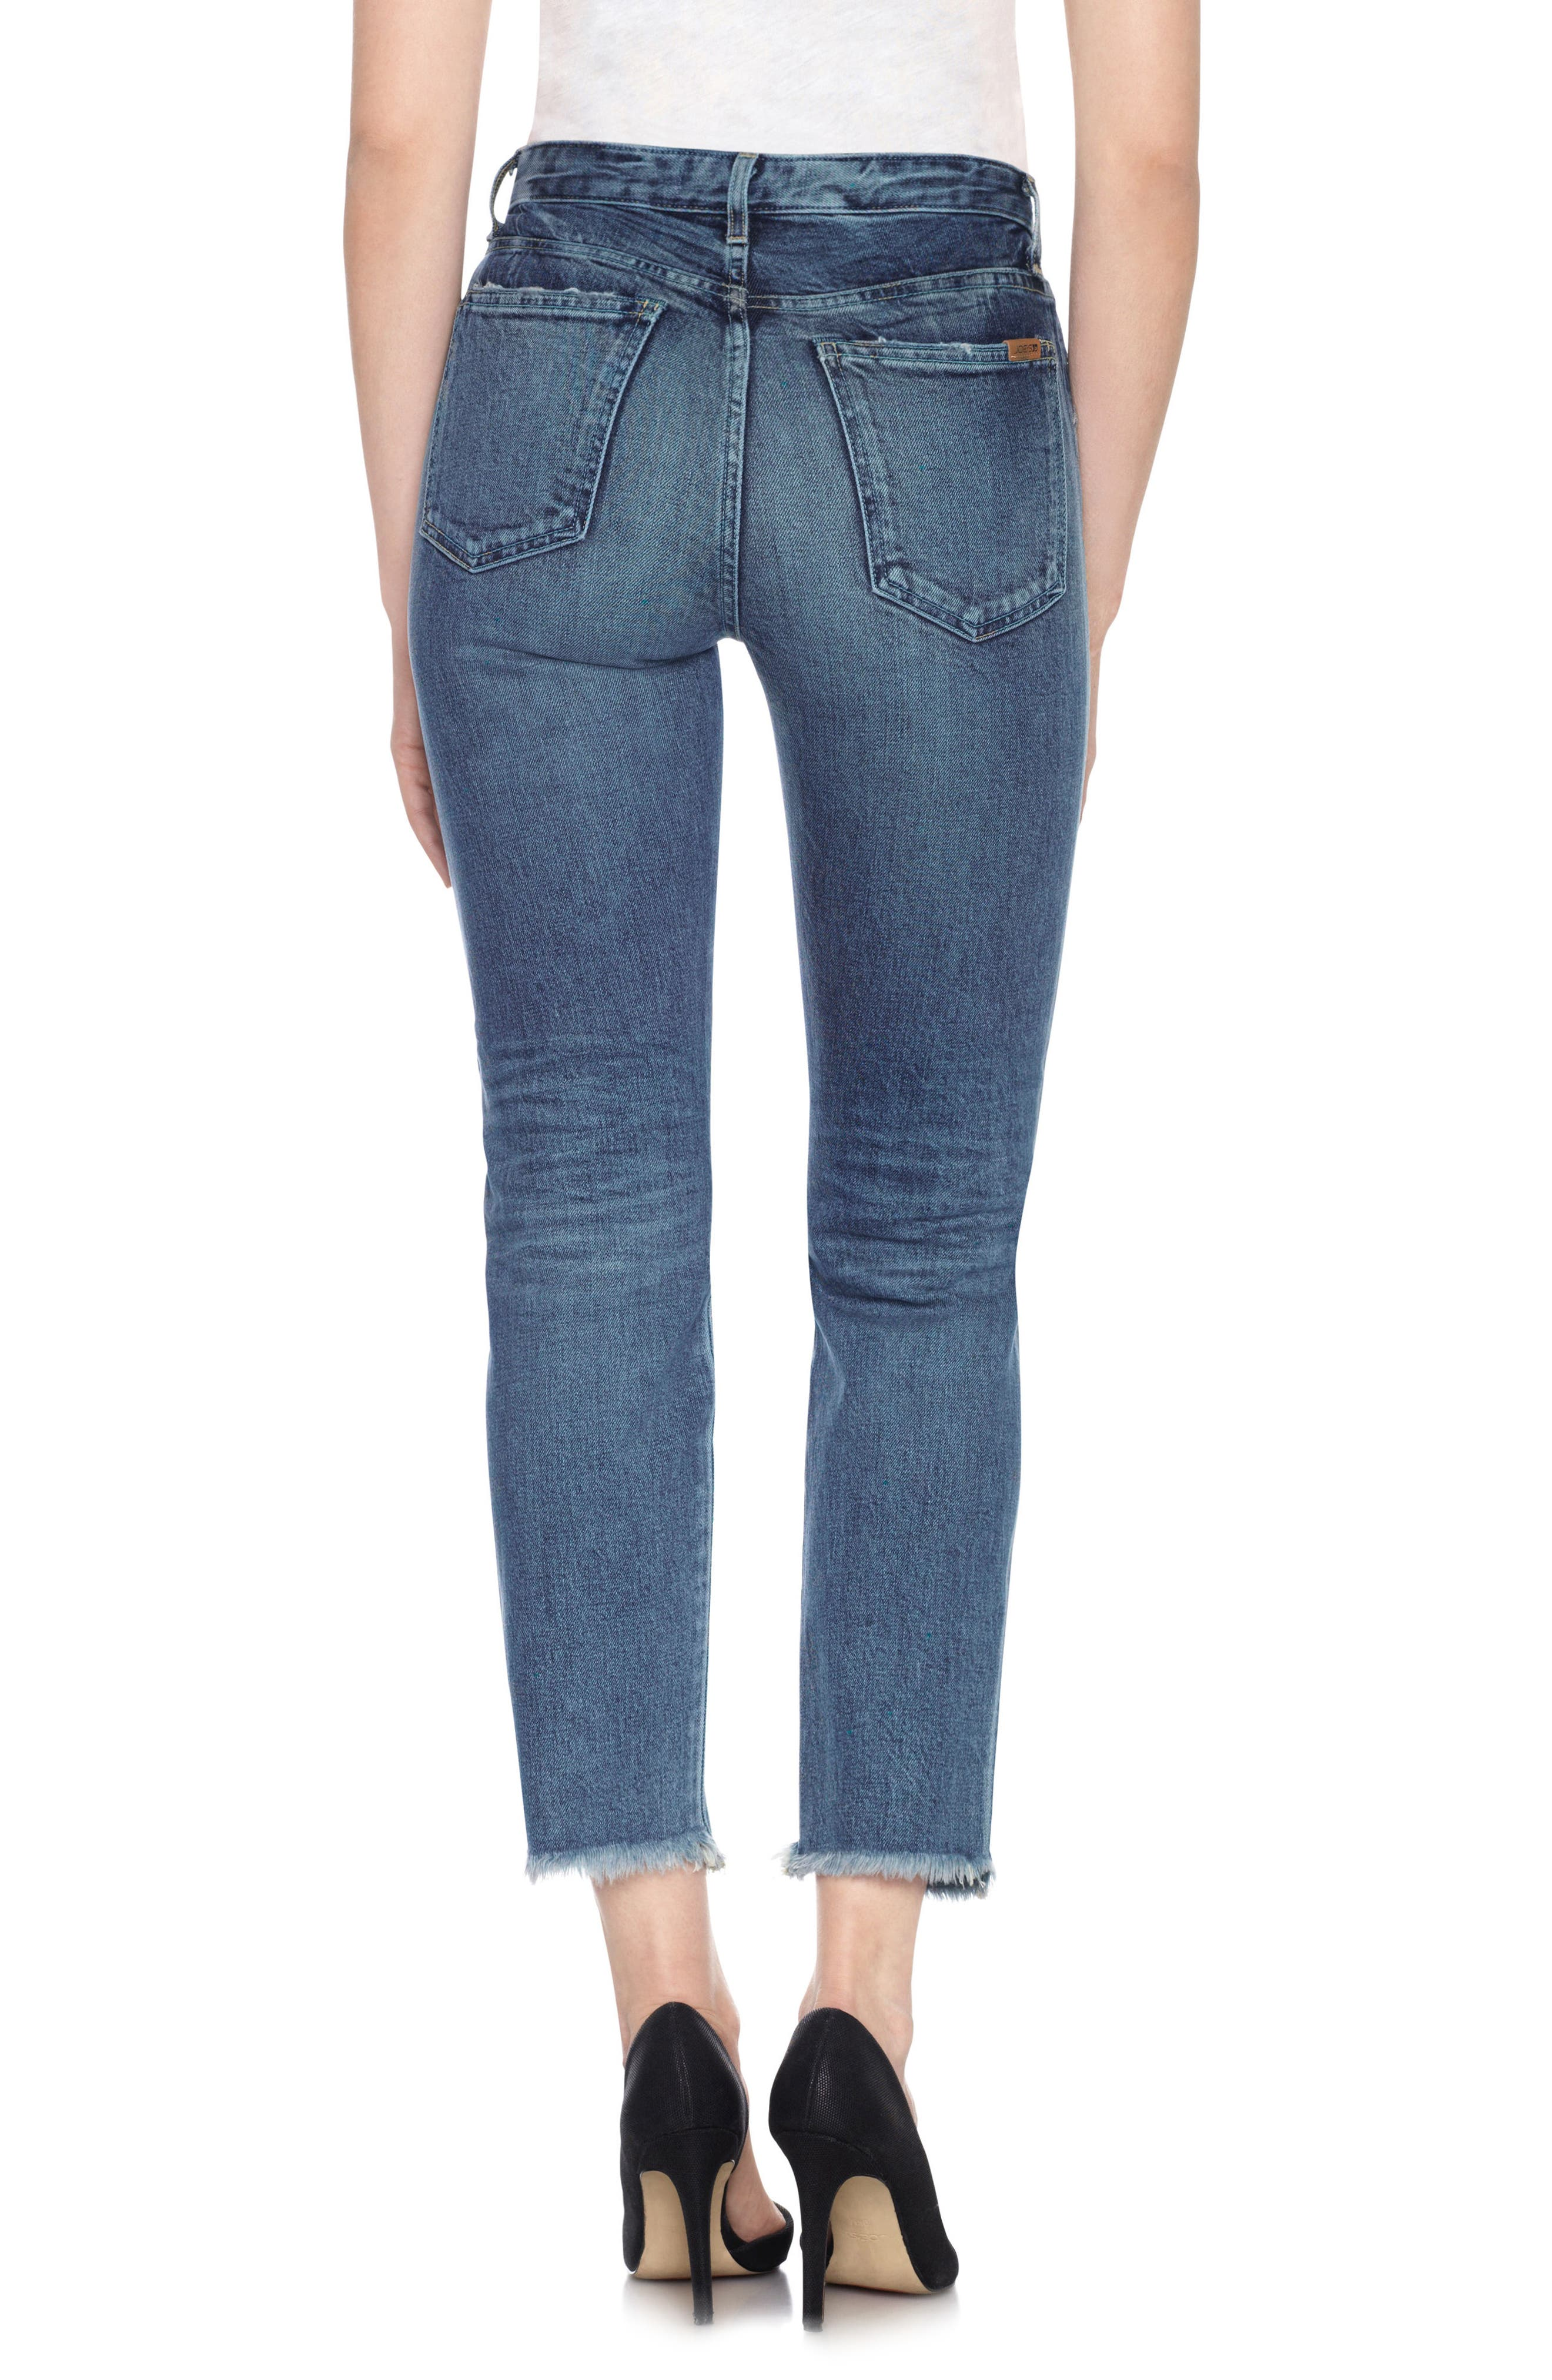 Taylor Hill x Joe's Debbie High Rise Ankle Jeans,                             Alternate thumbnail 2, color,                             Julee